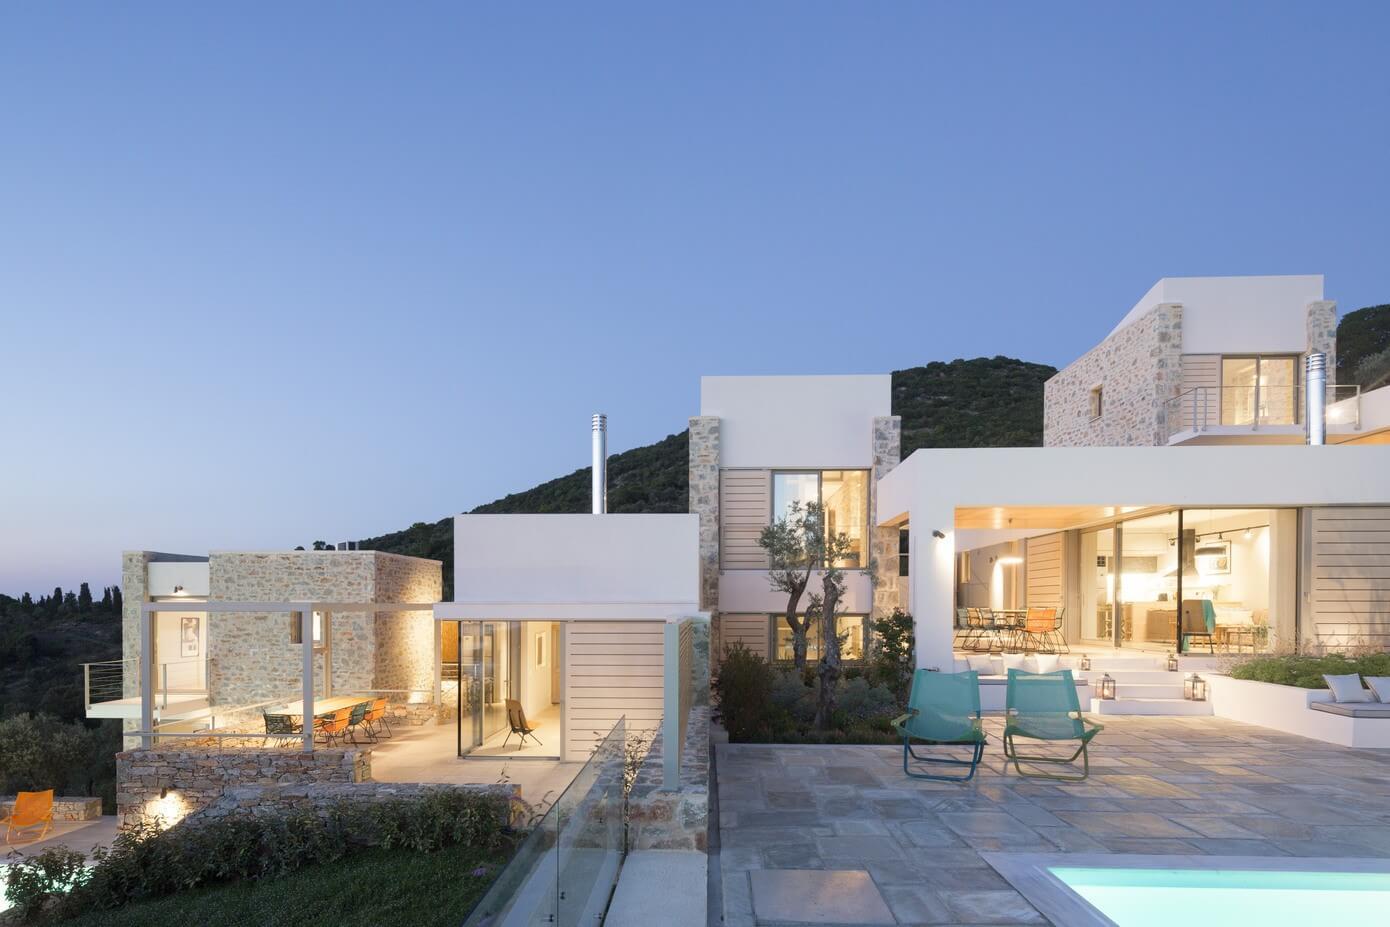 Atrium Villas By Hhh Architects Homeadore